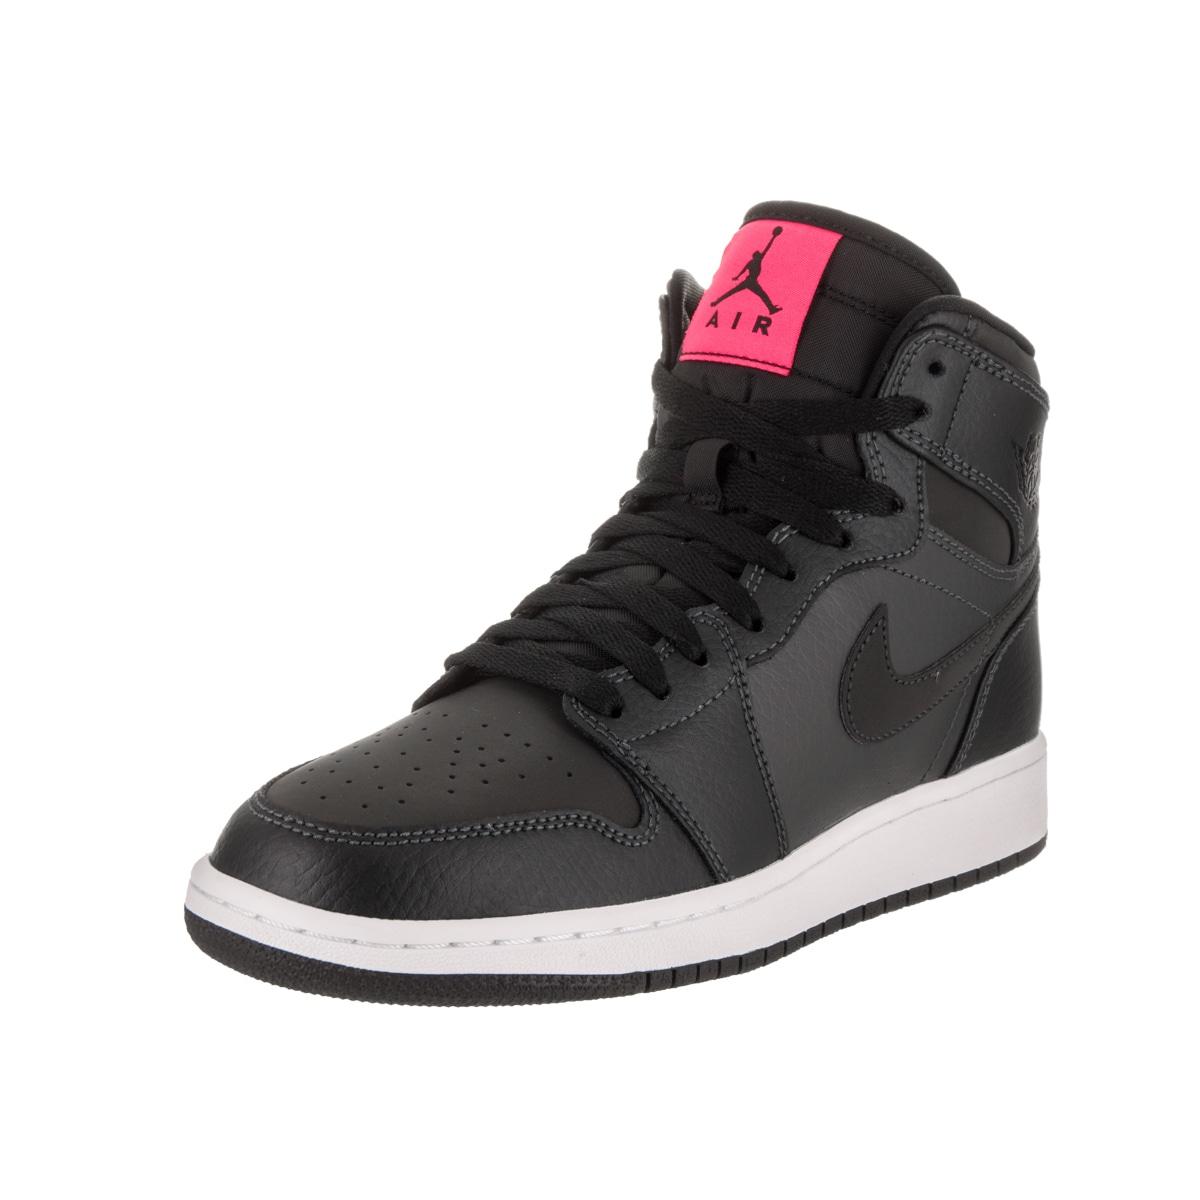 Nike Jordan Boys' Air Jordan 1 Retro High Gg Black Leathe...